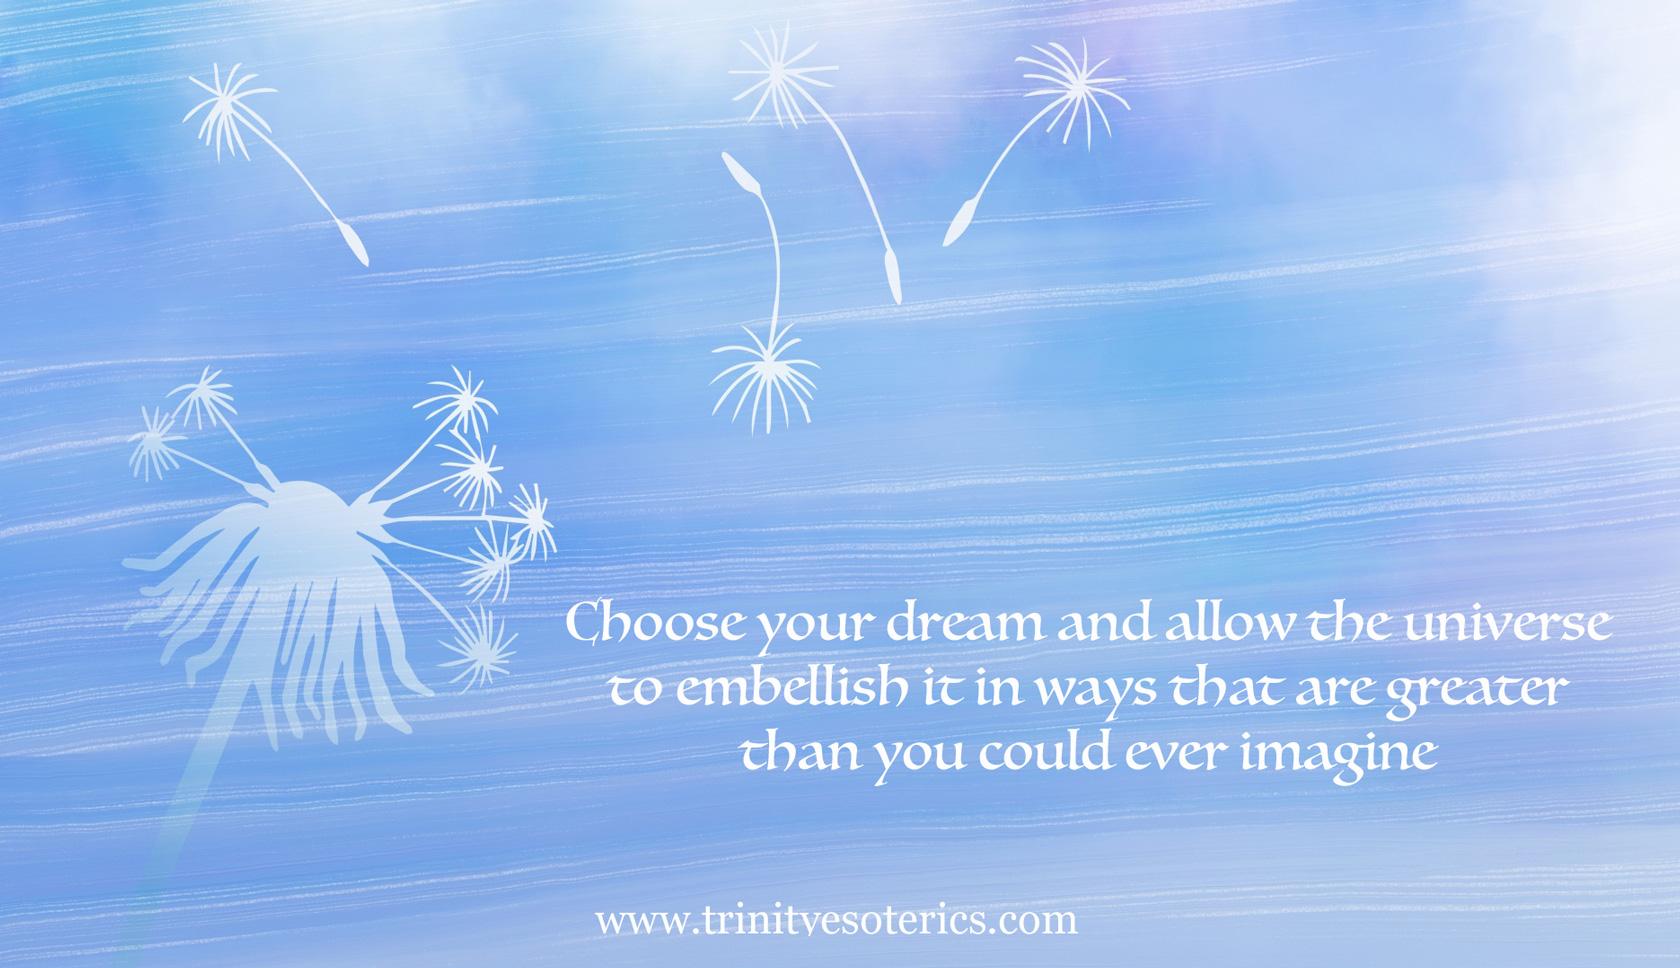 dandelion wishes choose dream trinity esoterics